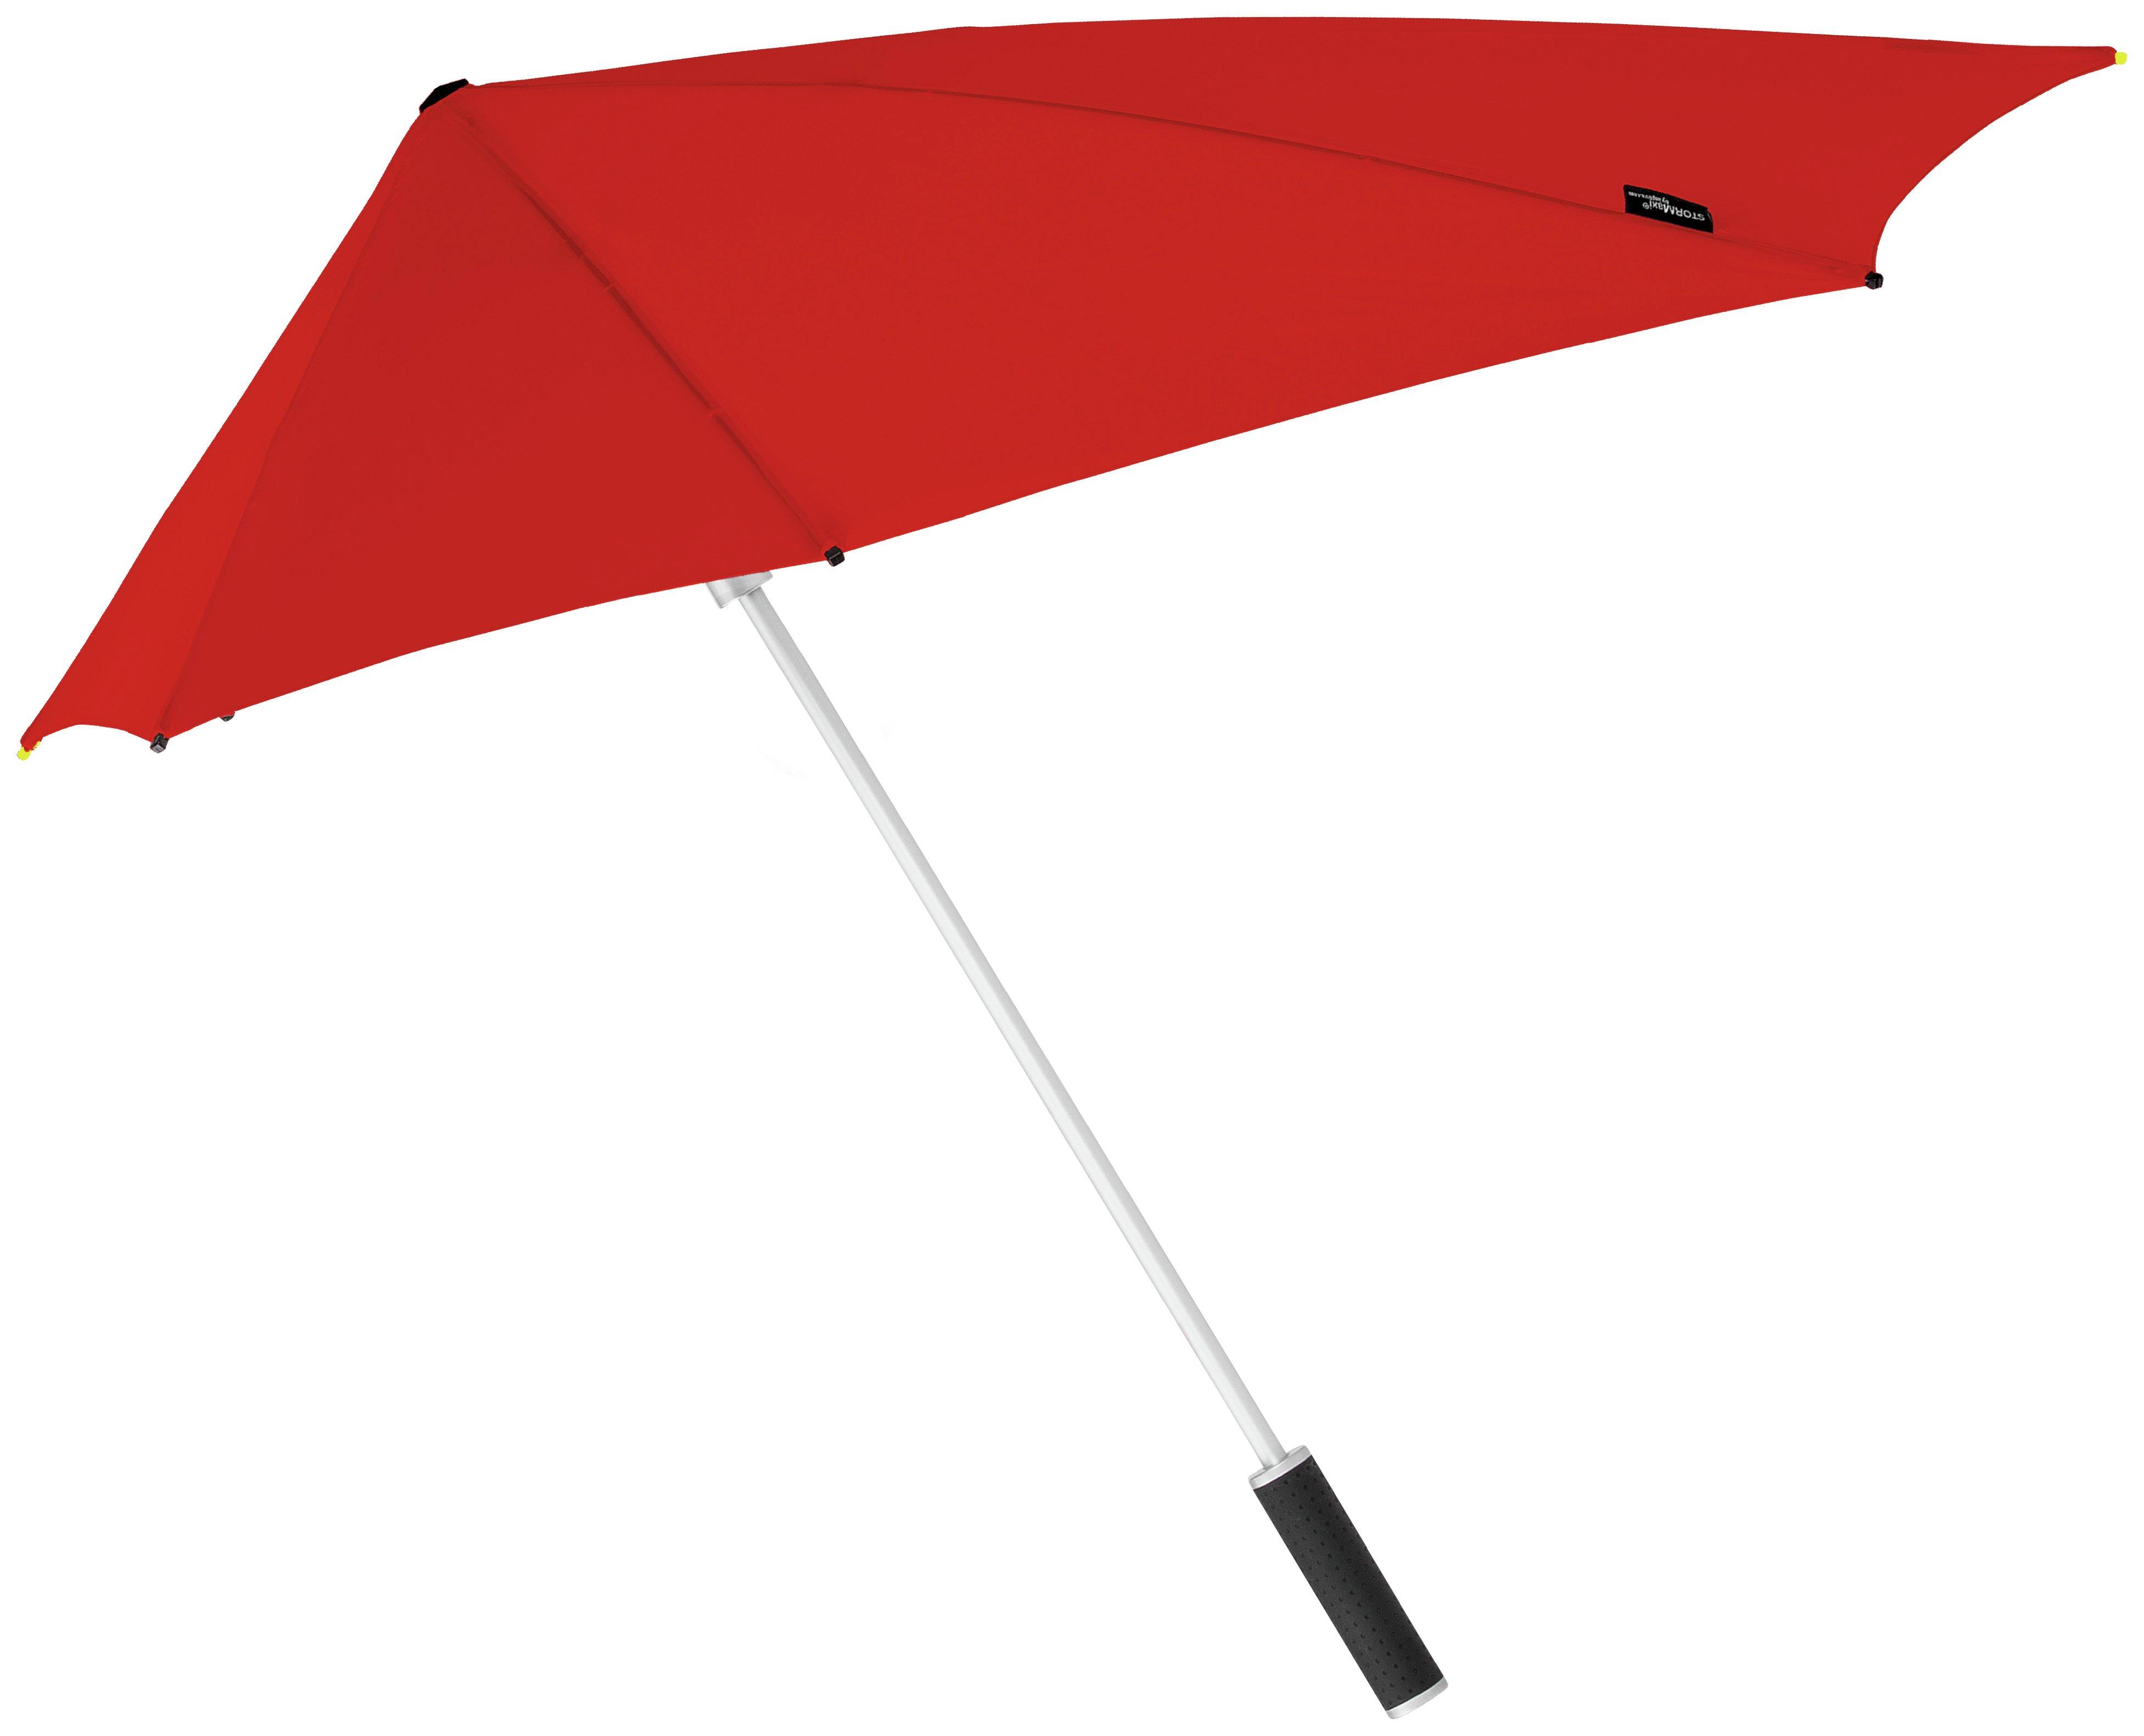 Stealthbomber Umbrella - Red.